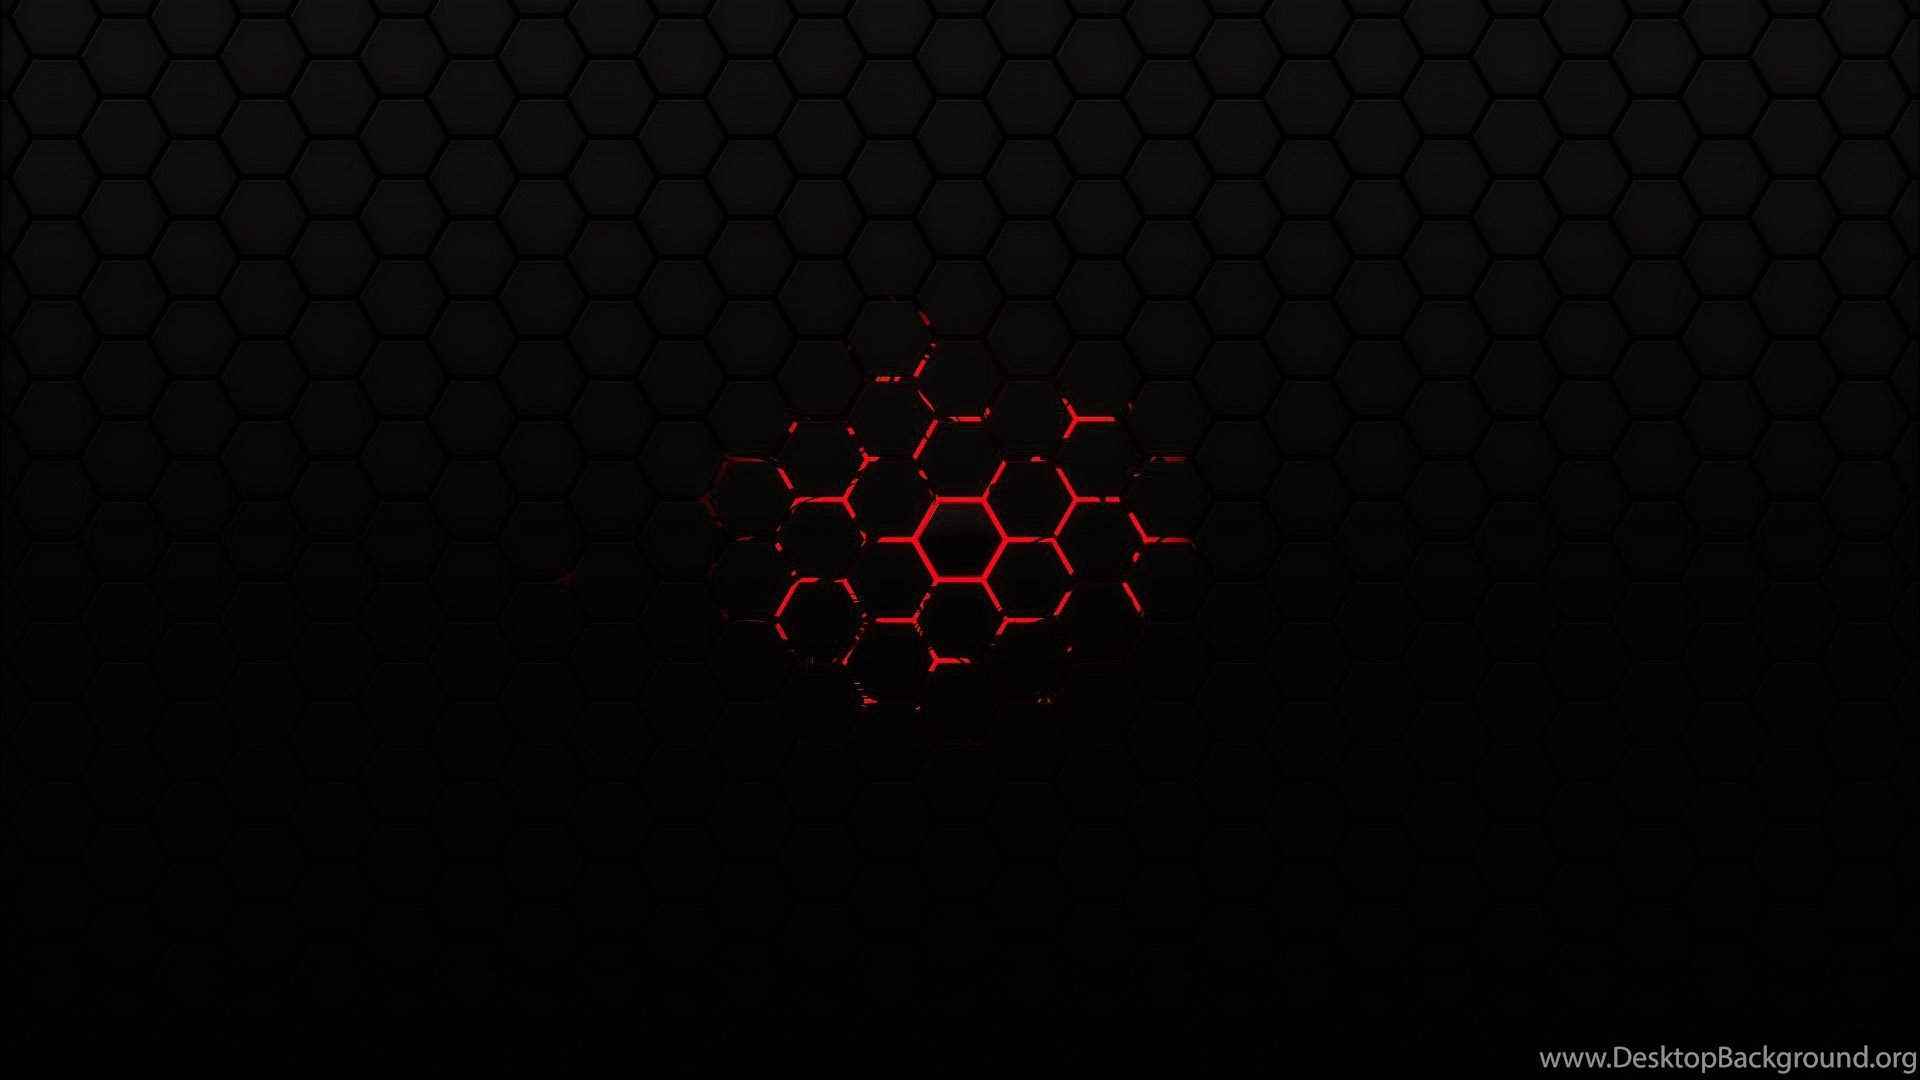 Black And Red Wallpapers Designs Desktop Background